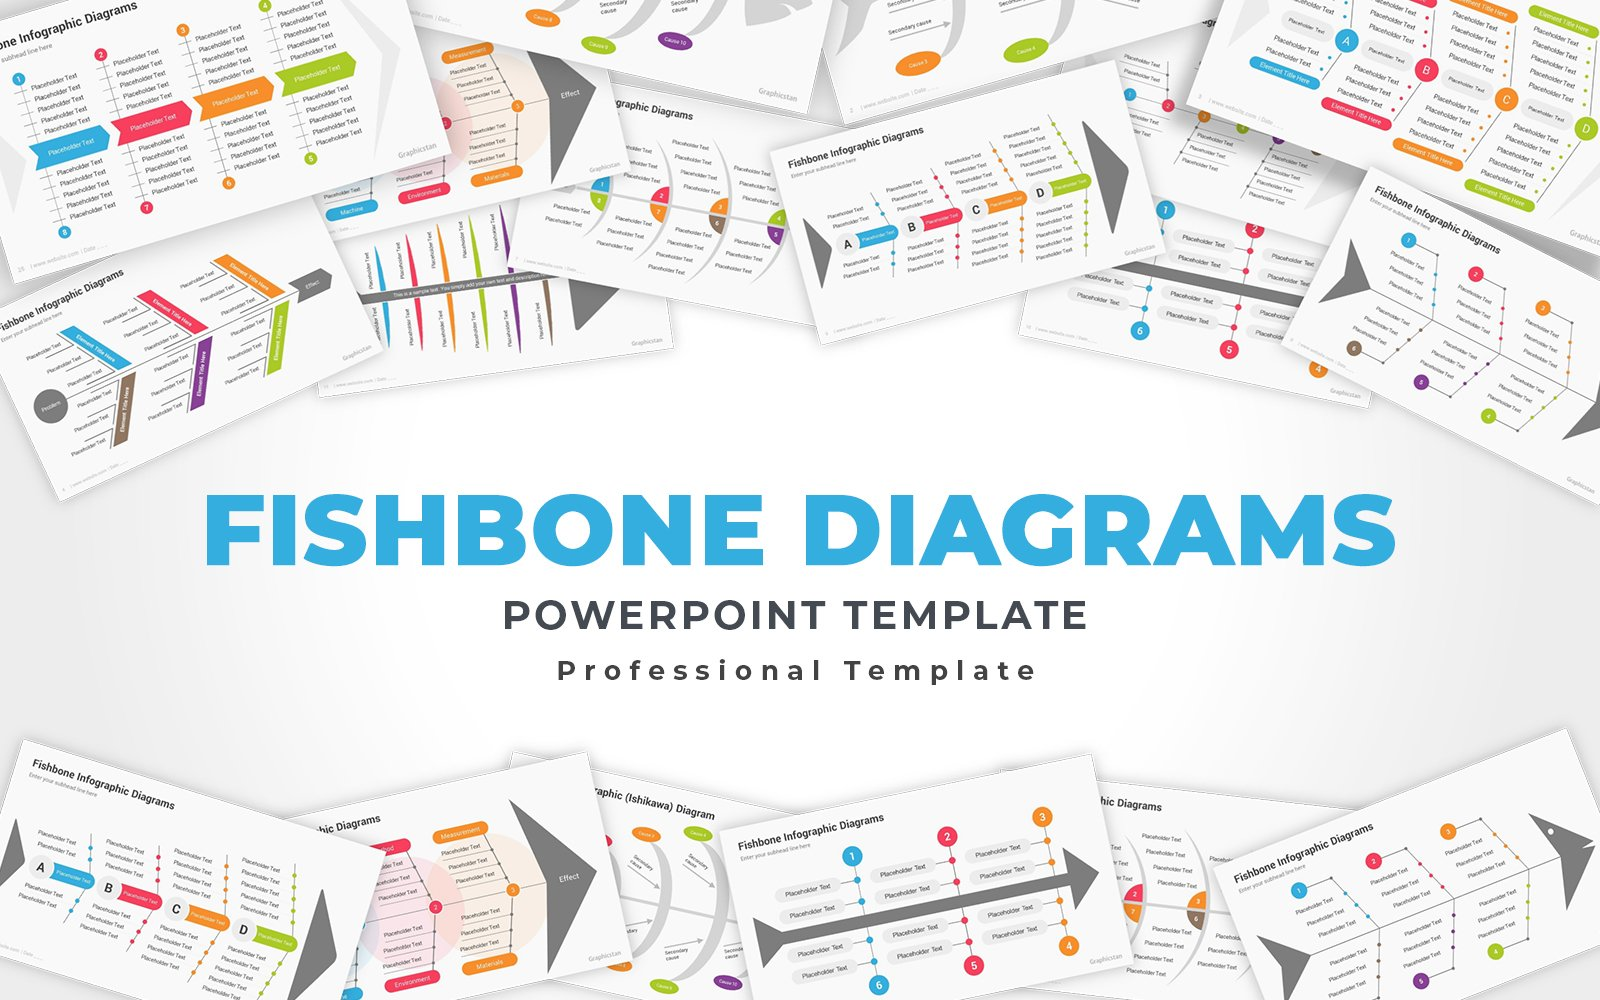 Fishbone or Ishikawa Diagrams PowerPoint Template